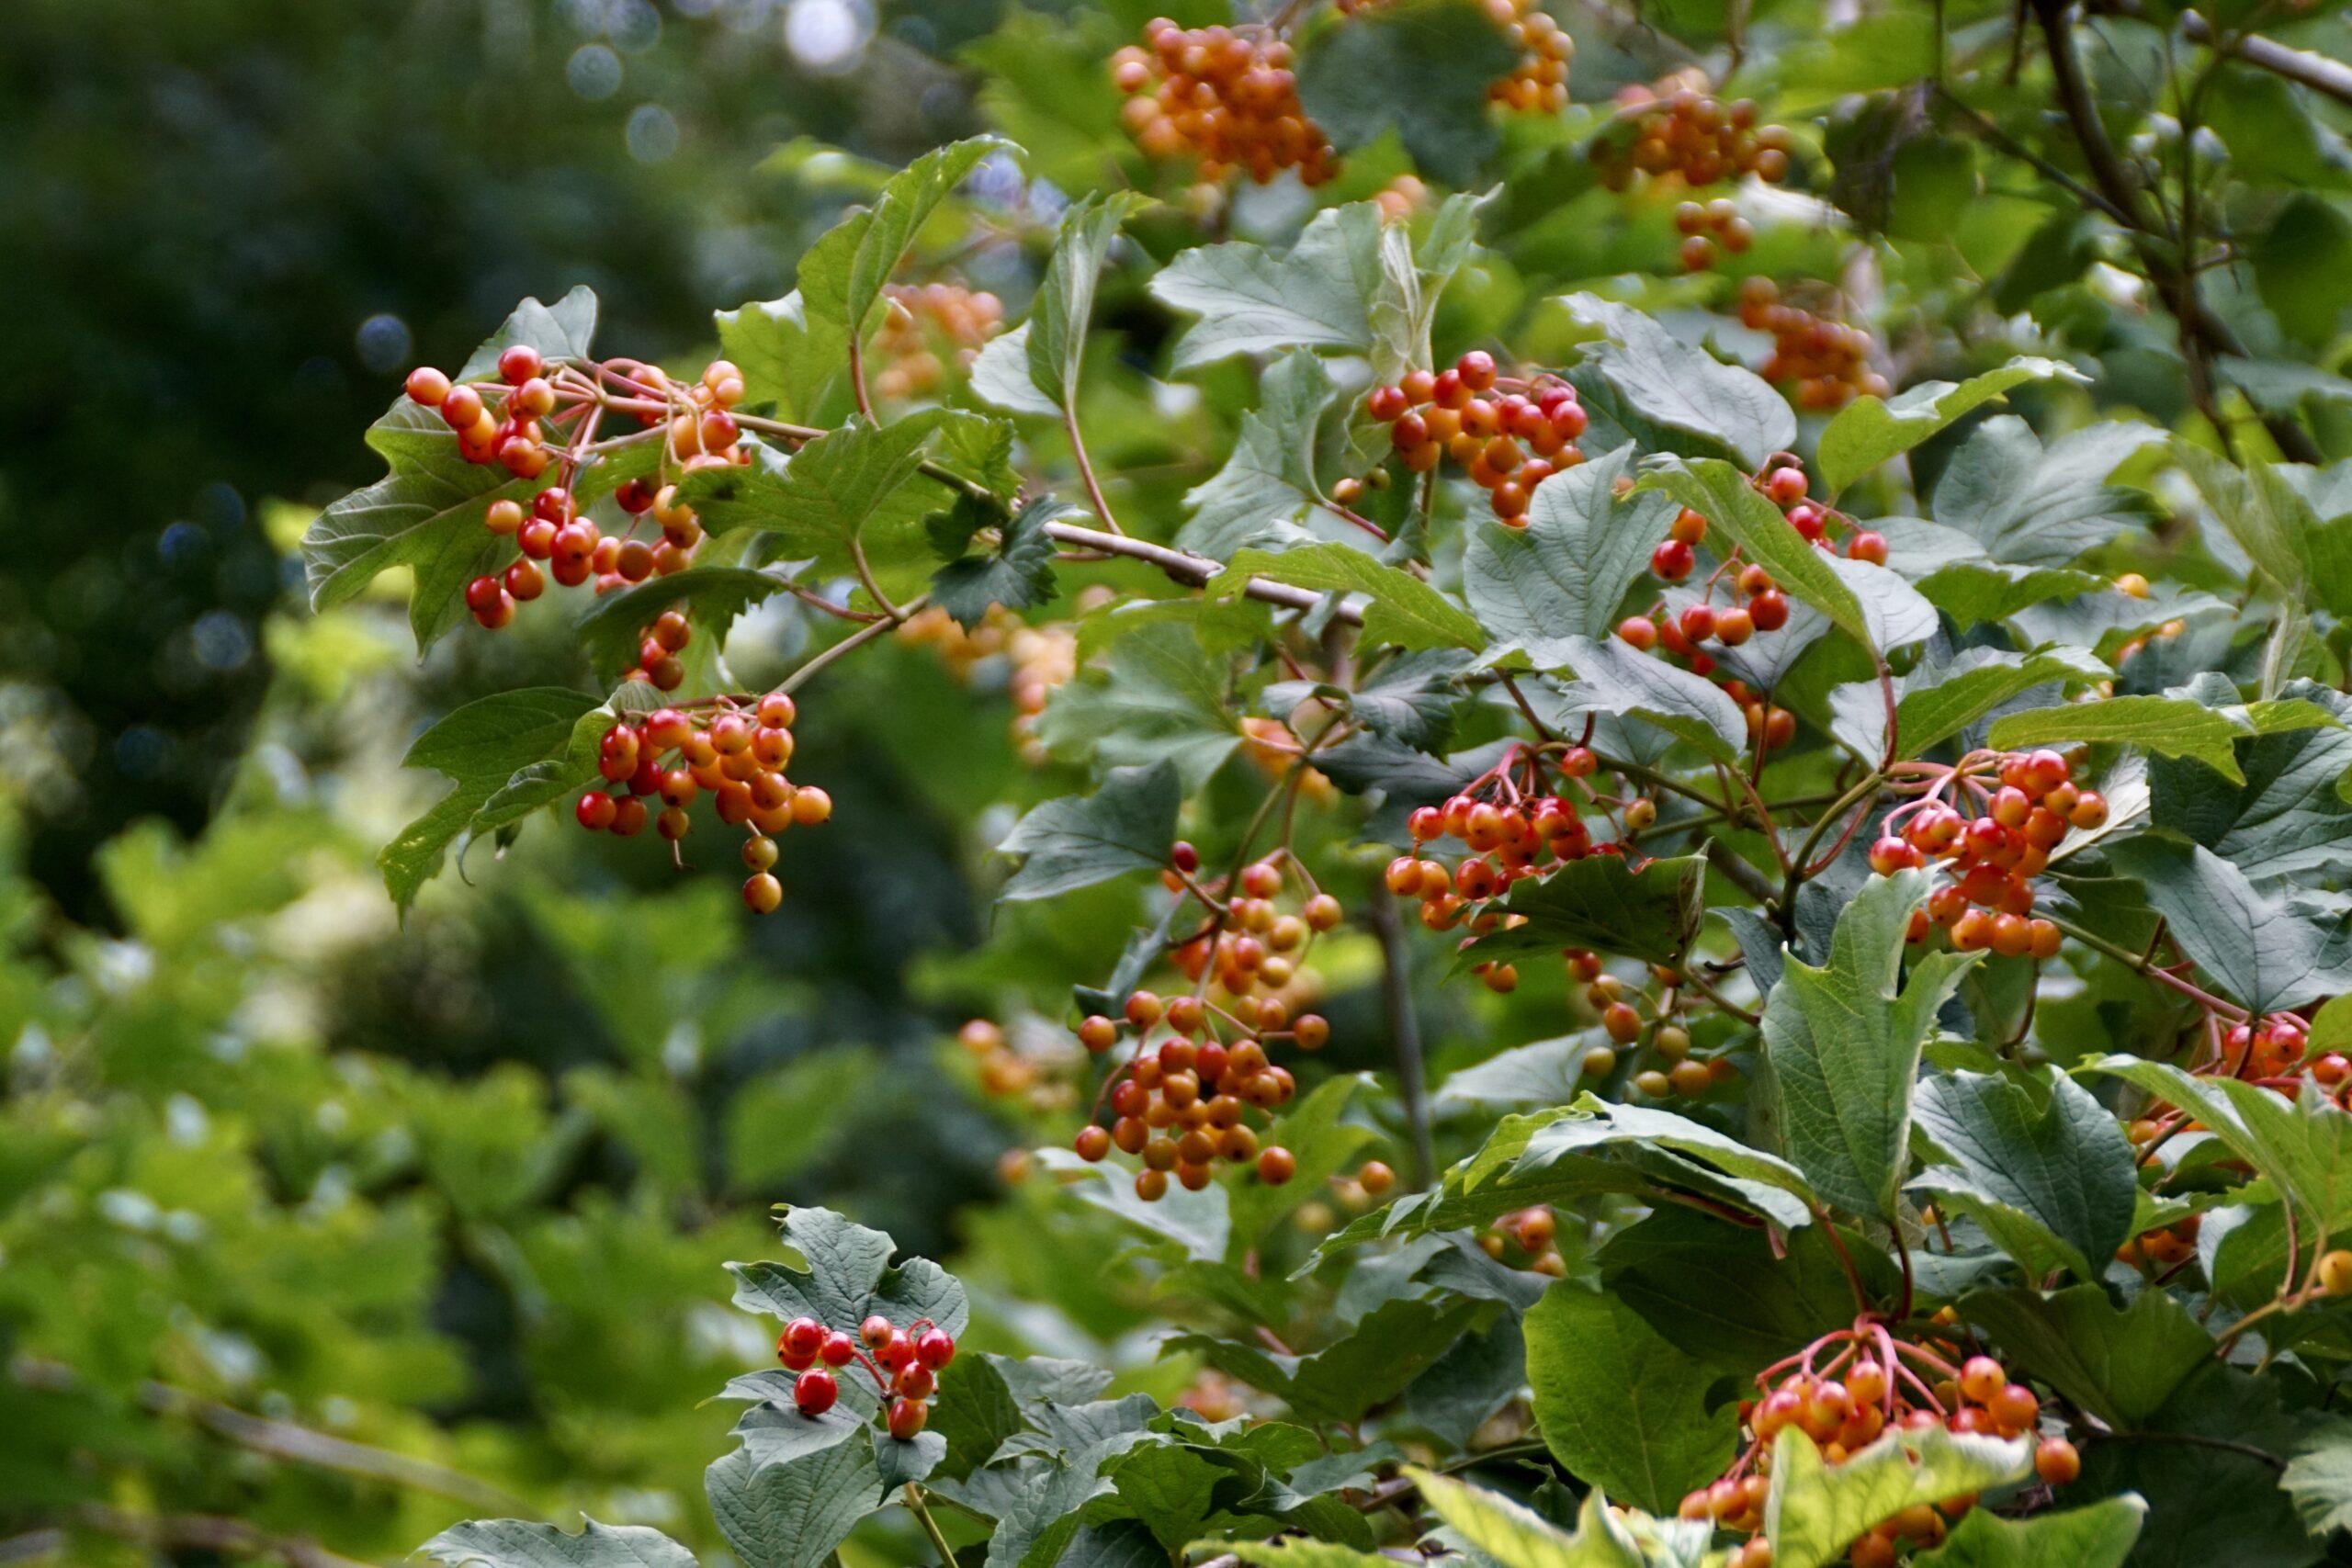 Berries on guilder rose - July